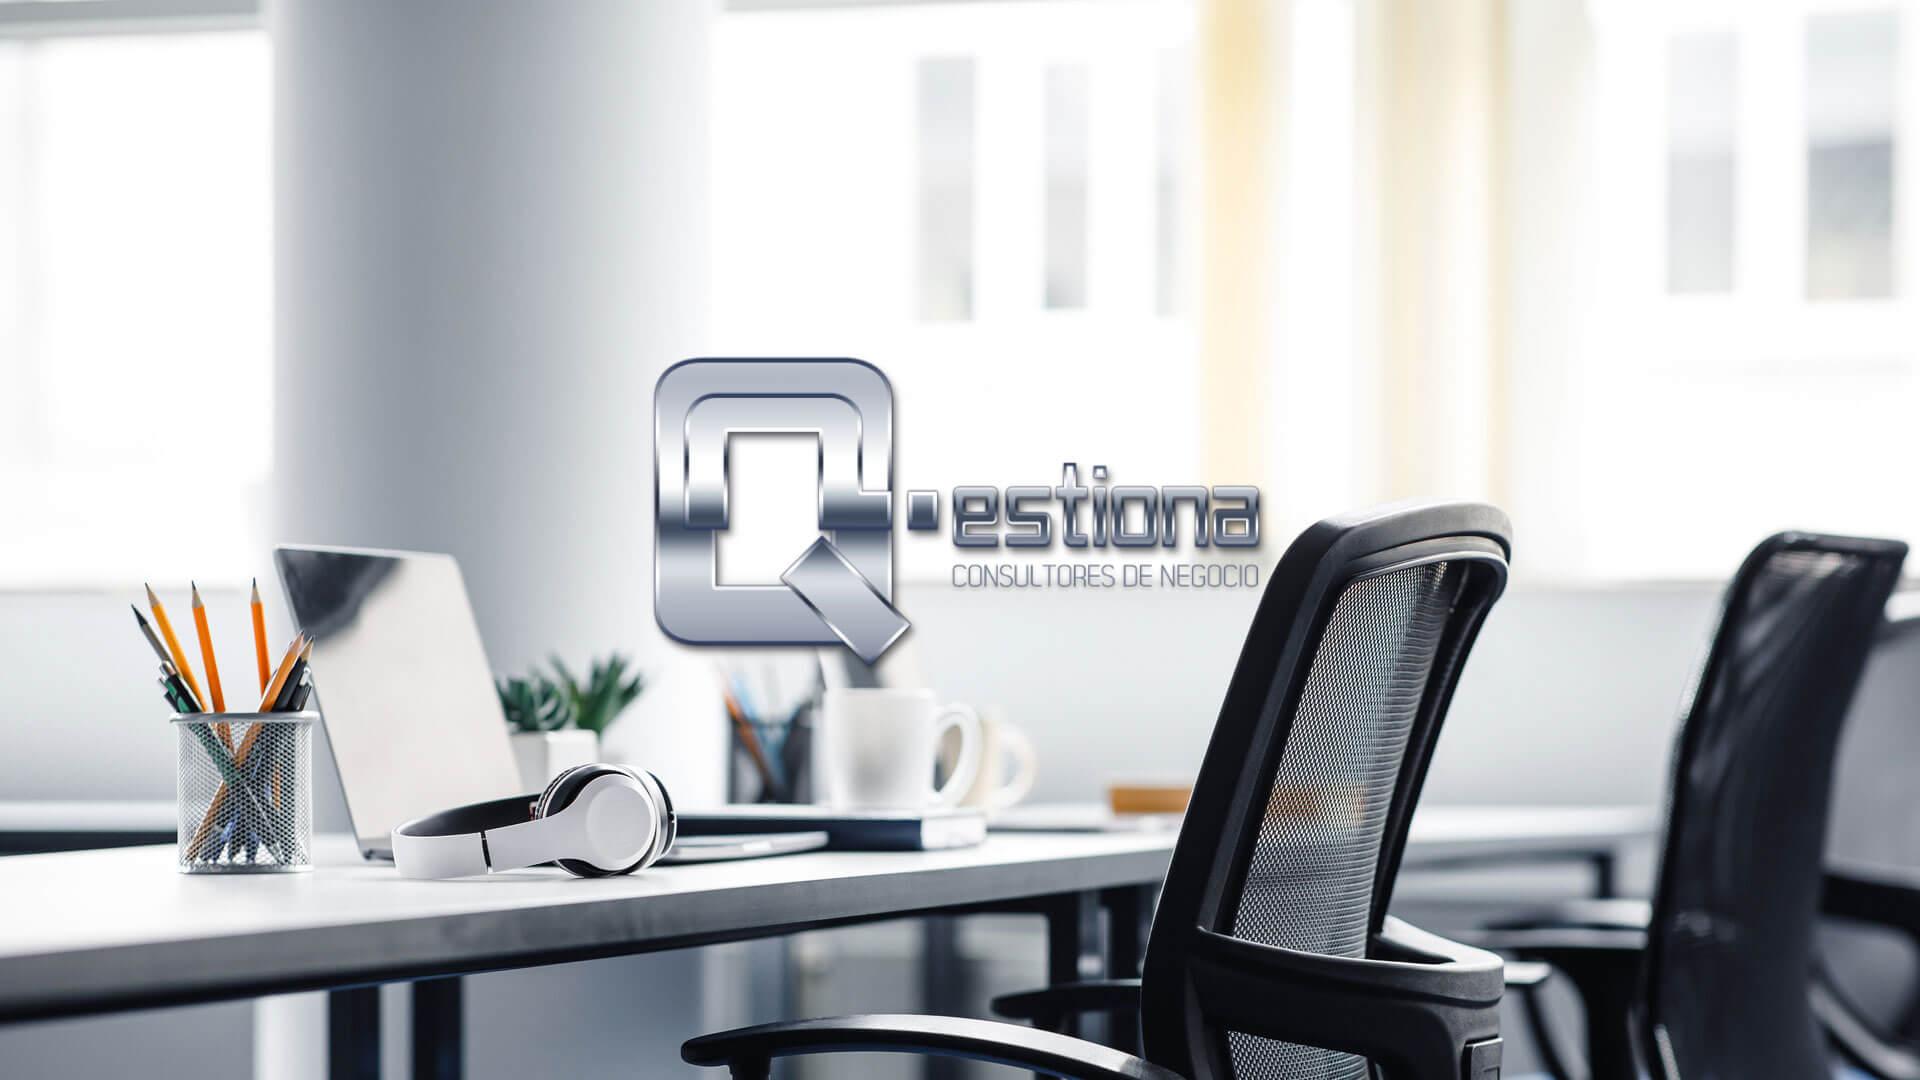 Diseño grafico Qestiona